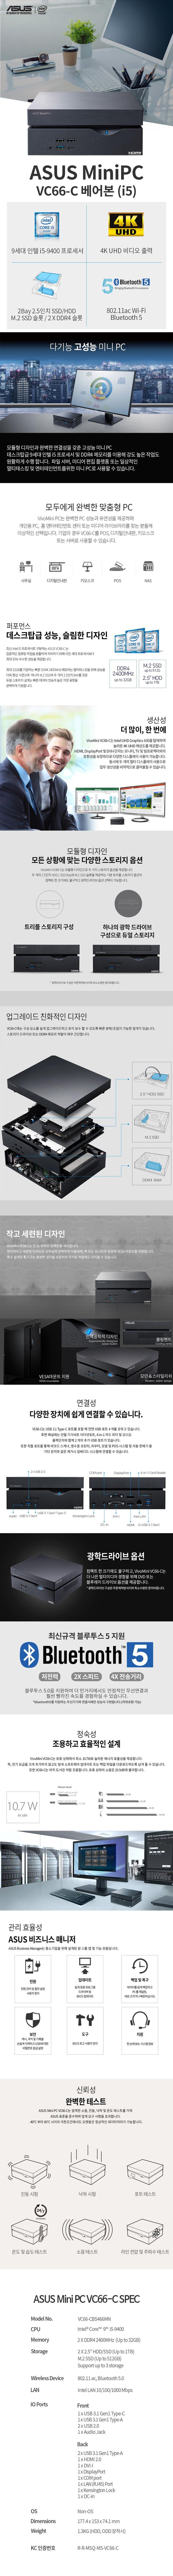 ASUS VivoMini VC66-C i5-9400 M2 (32GB, M2 1TB + 2TB)